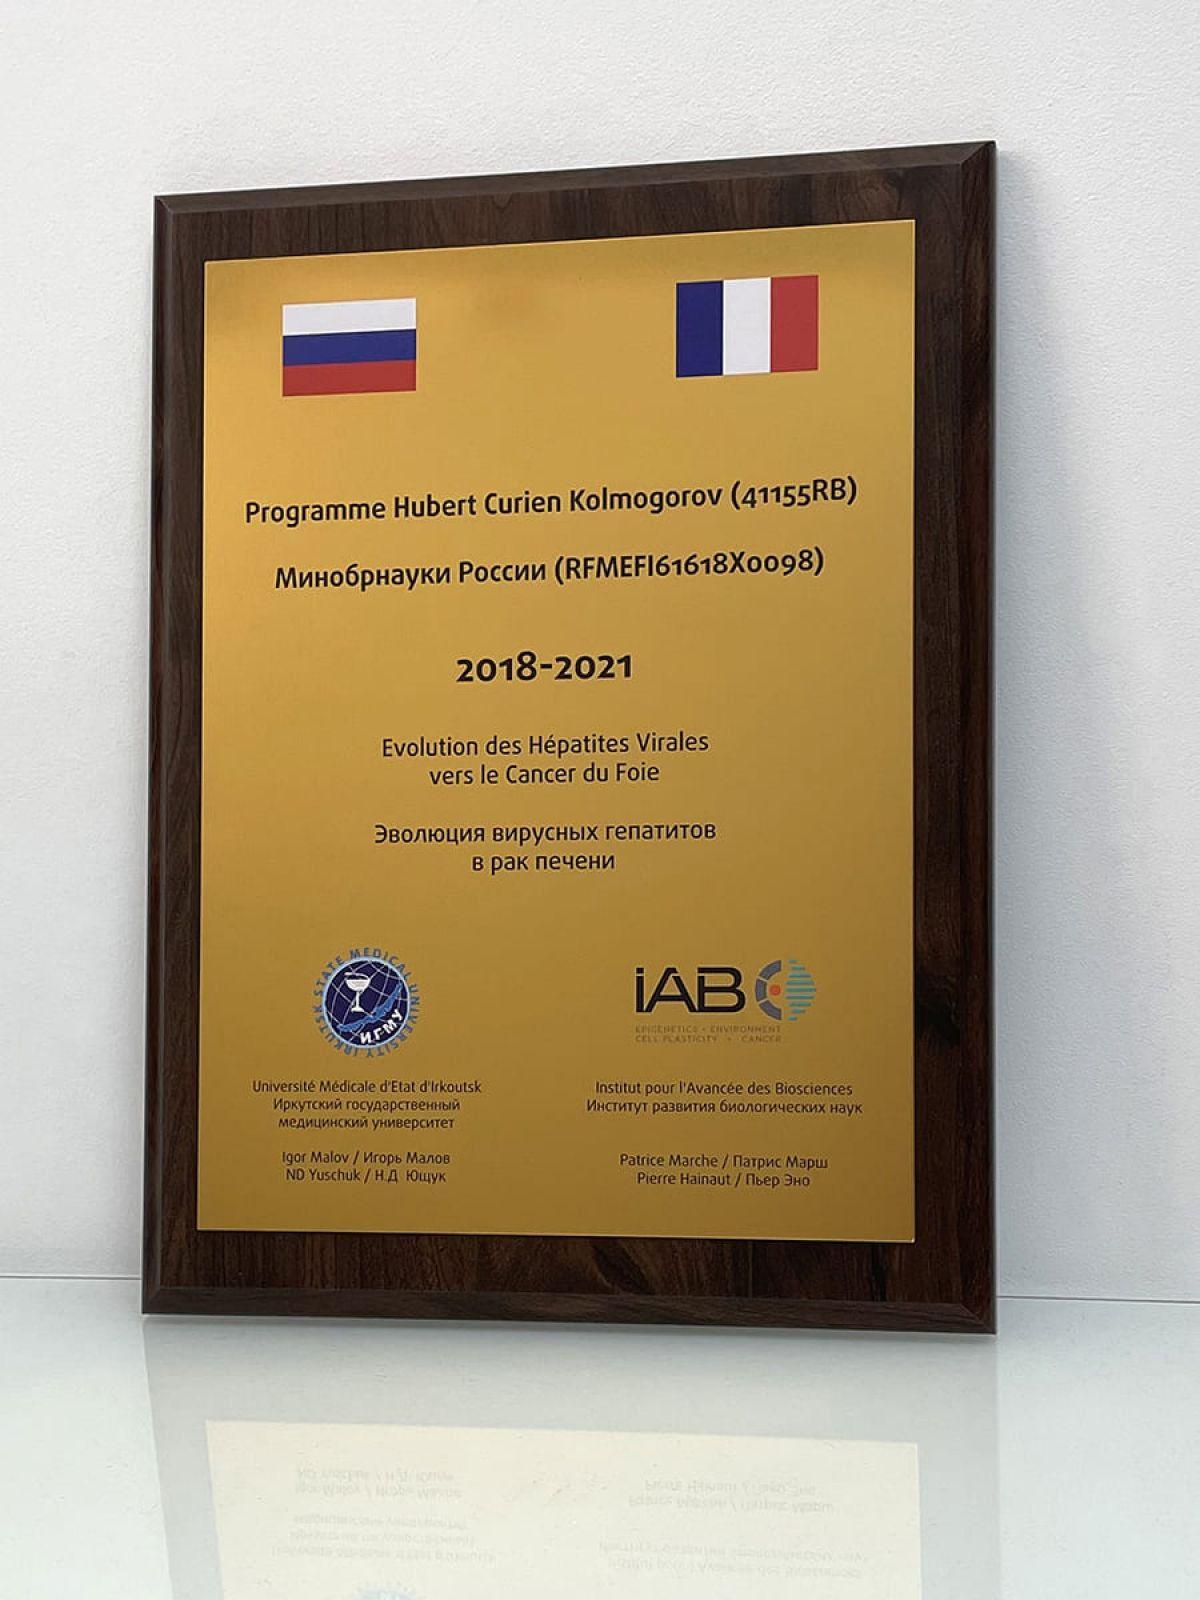 plaque-IAB-2